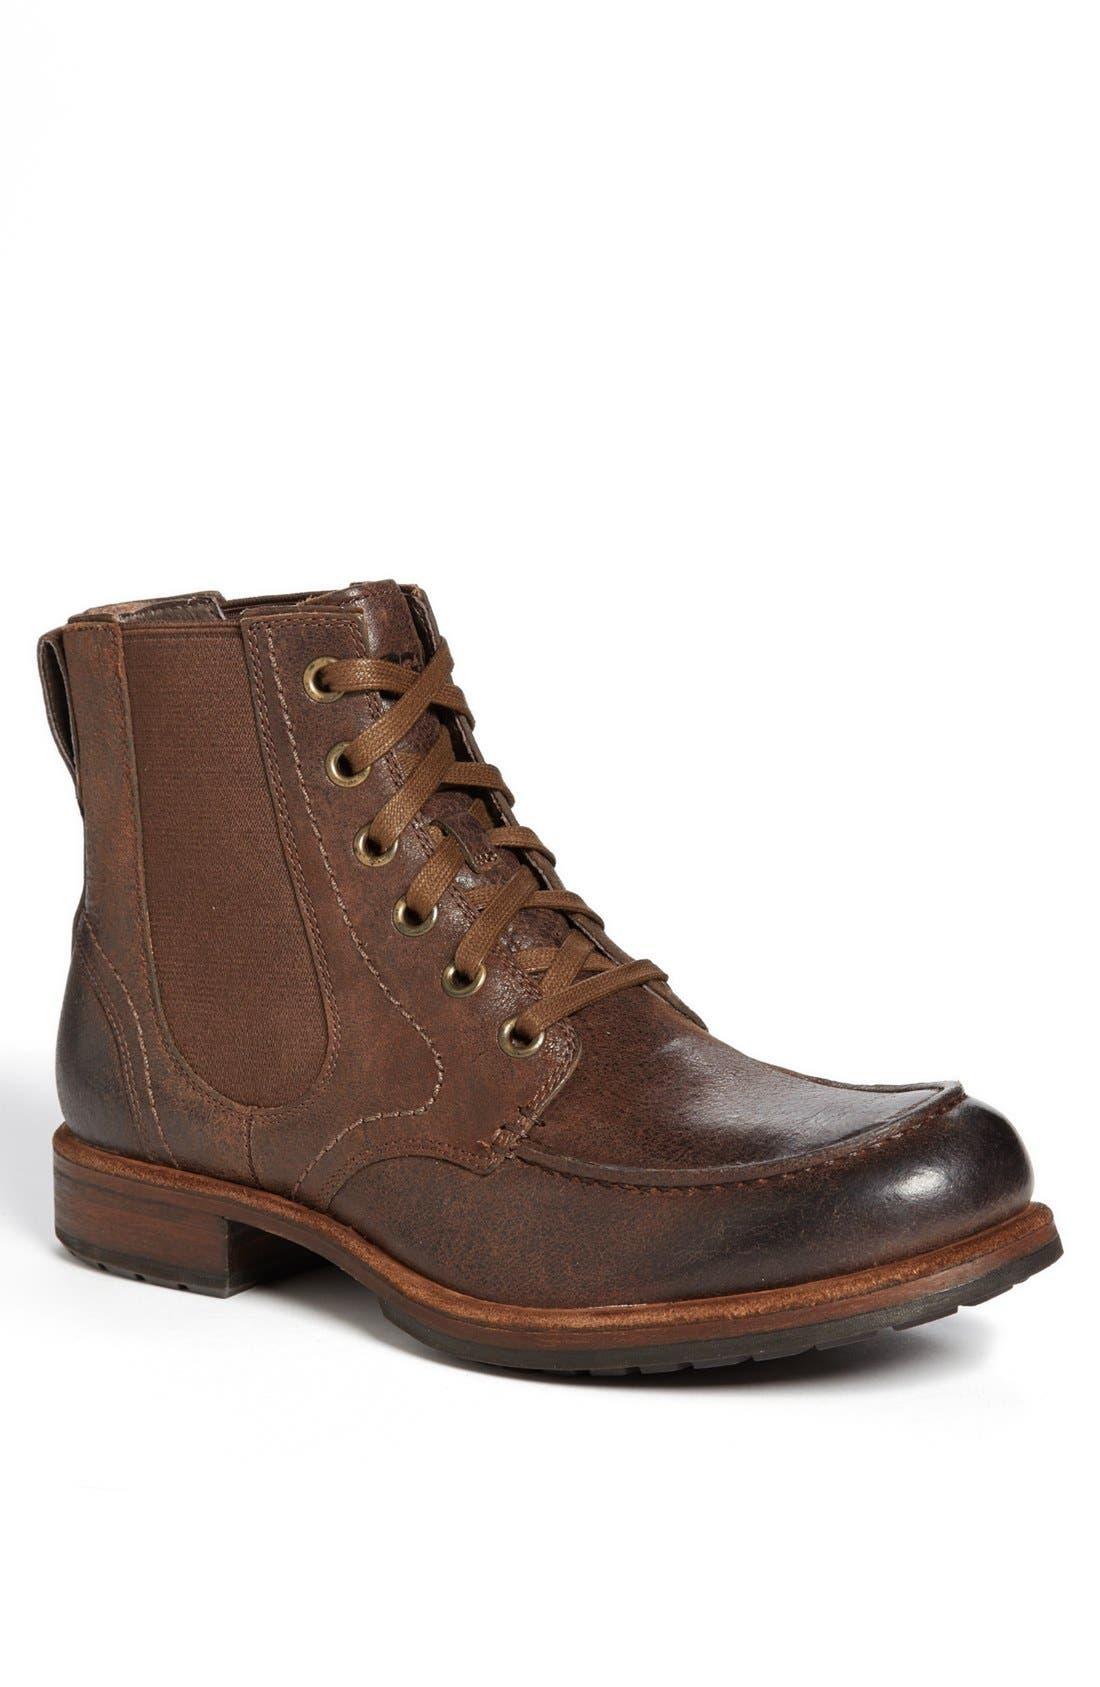 Alternate Image 1 Selected - UGG® Australia 'Jarrett' Moc Toe Boot (Men)